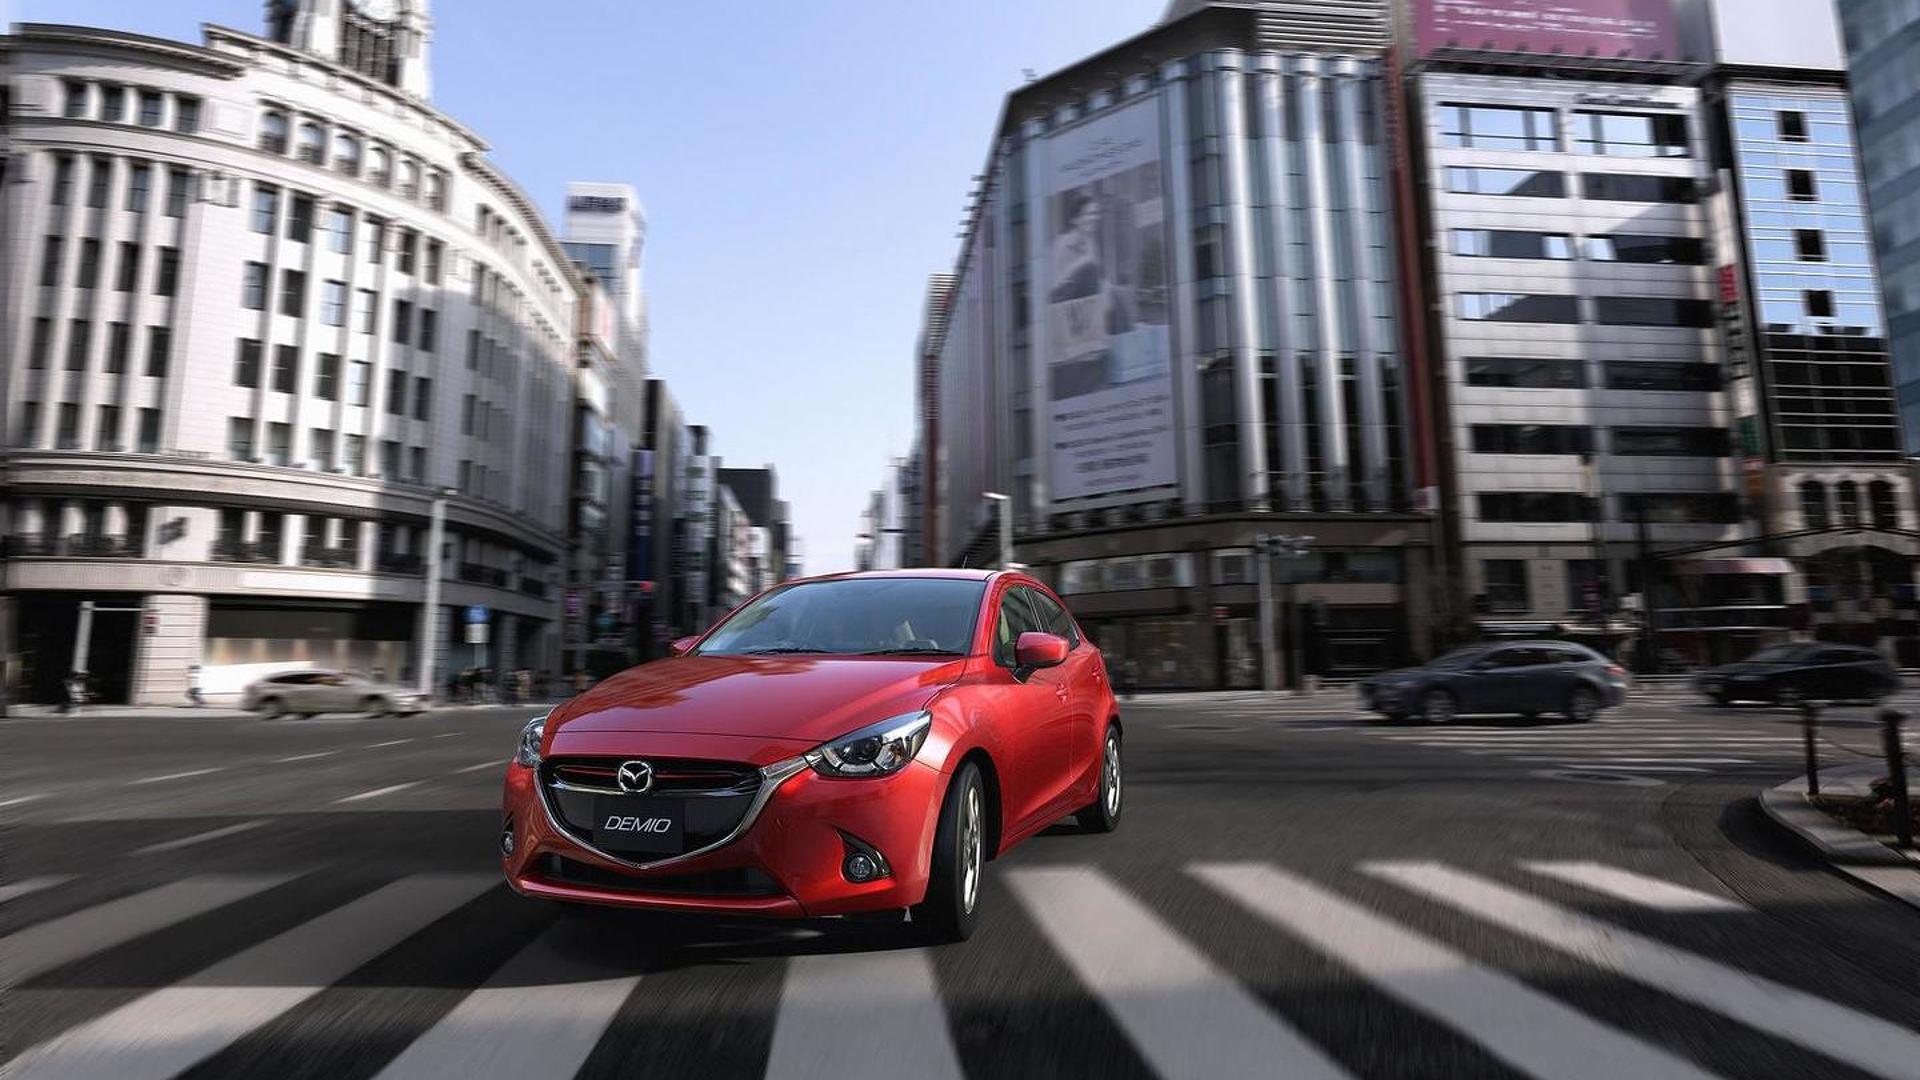 2015 Mazda2 / Demio goes official [videos]